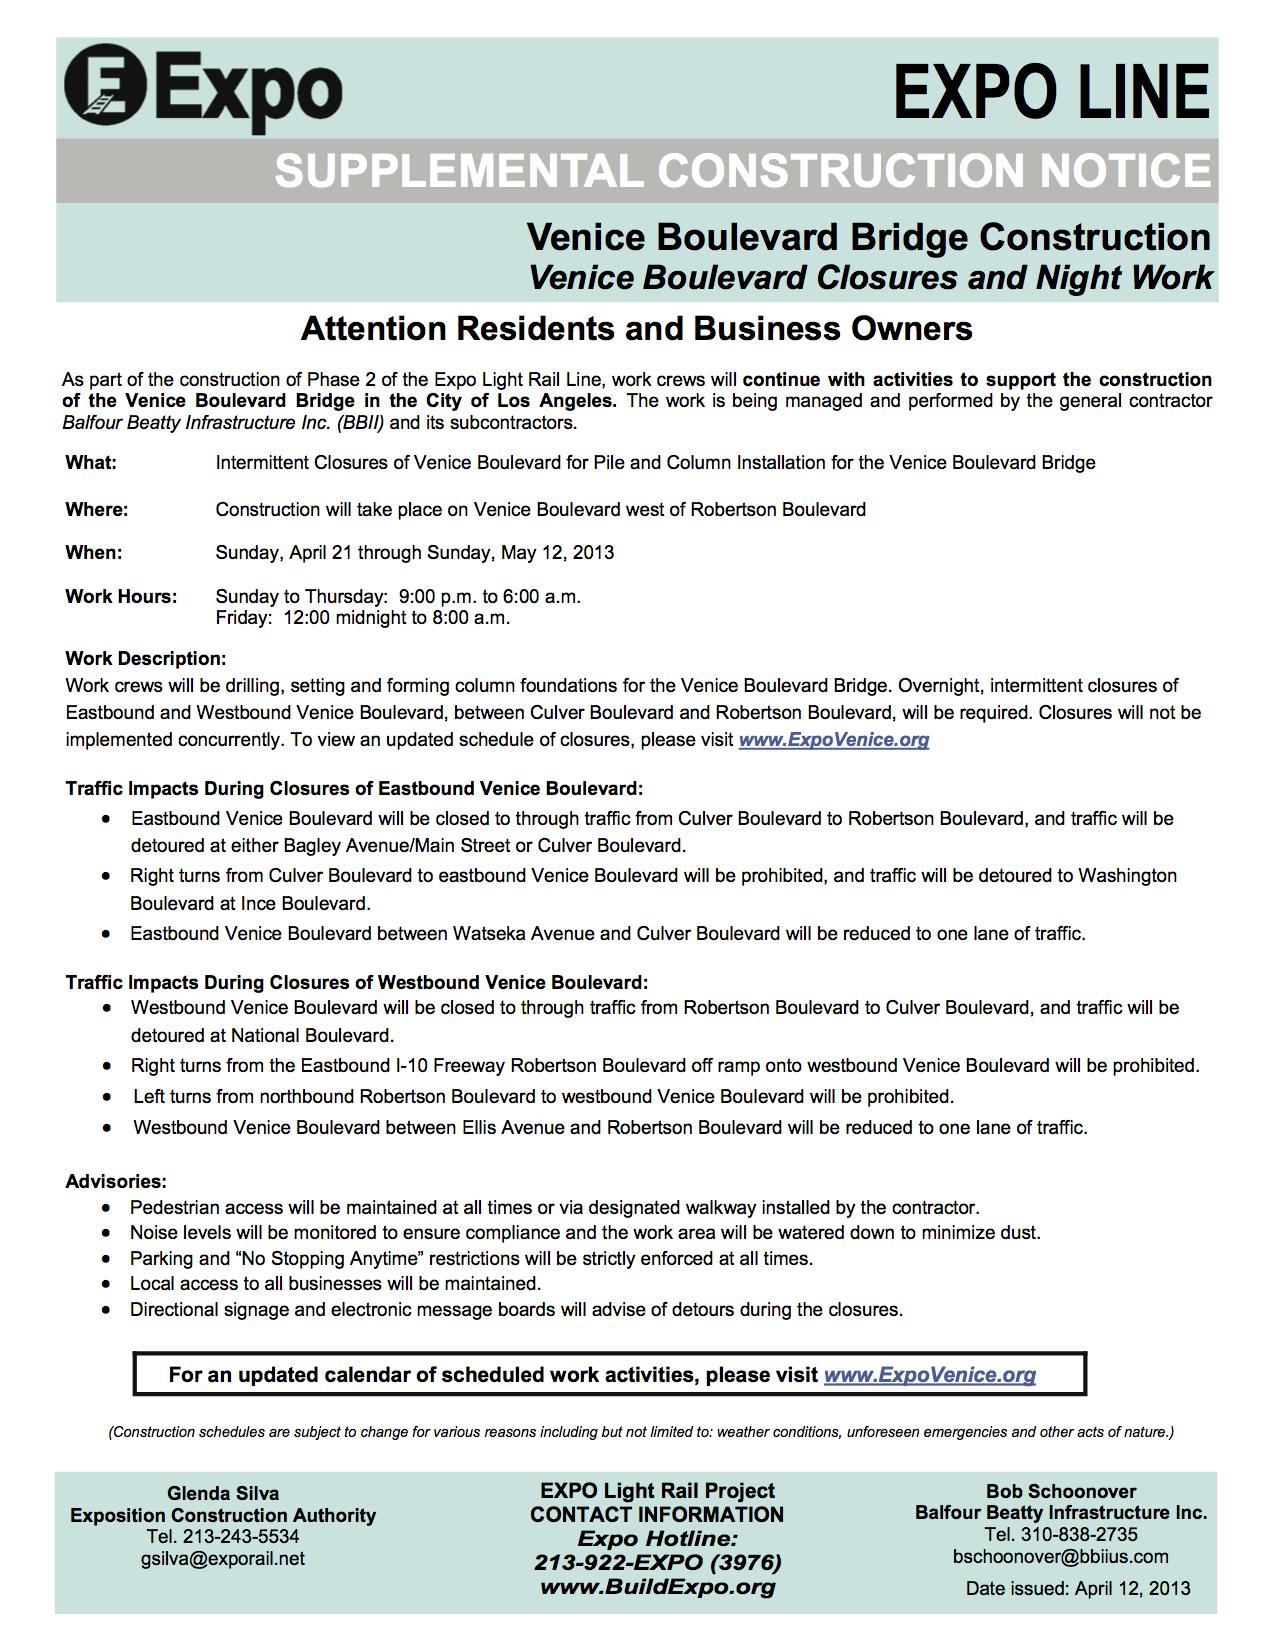 041213-Venice-Boulevard-Bridge-Construction-Venice-Boulevard-Median-Pile-and-Columns